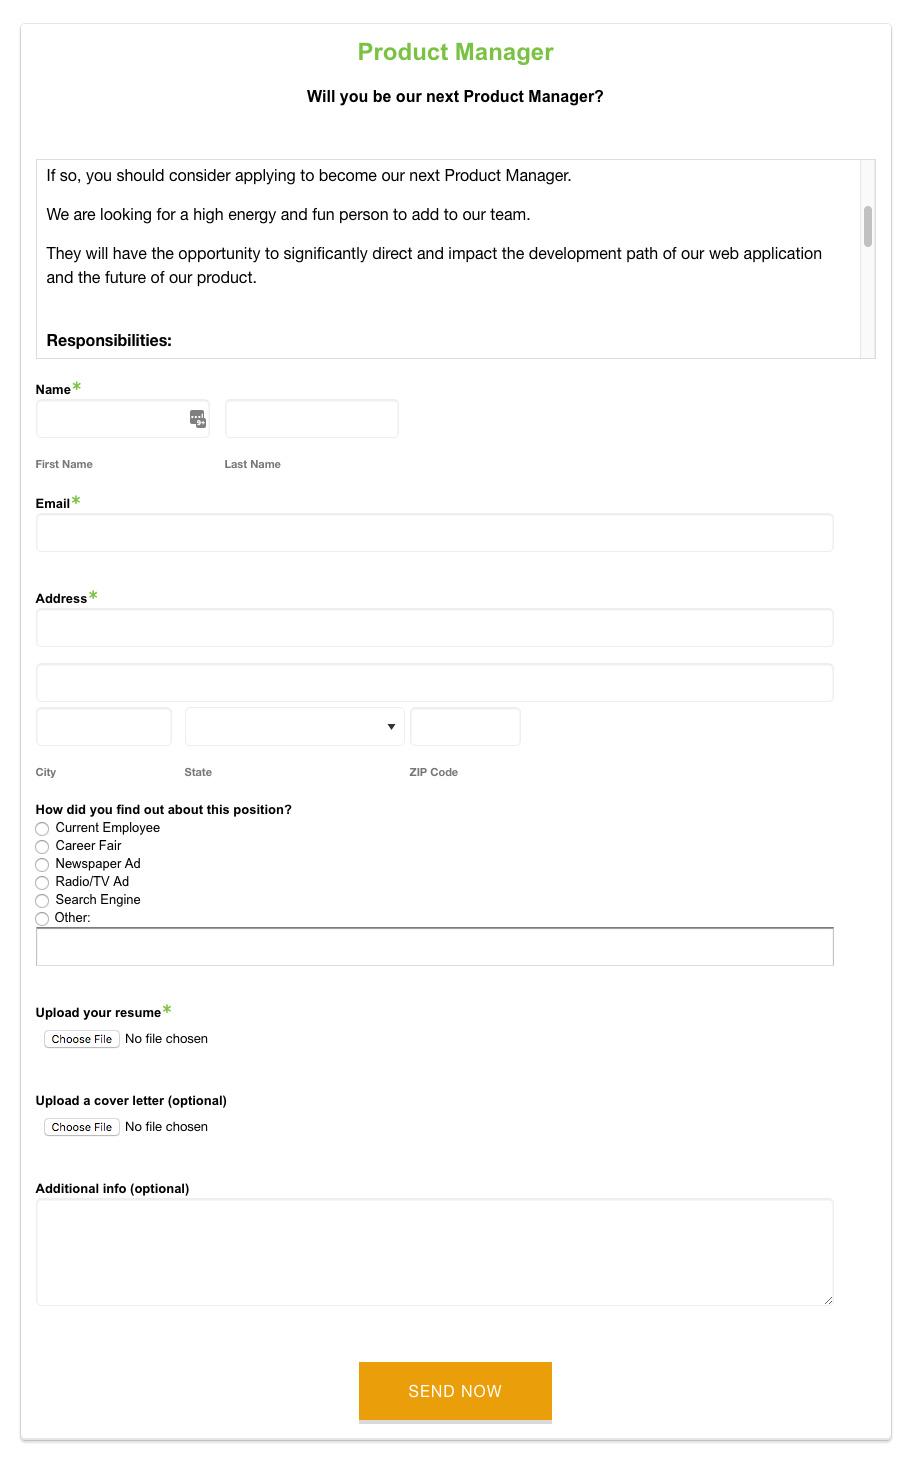 Hiring Process: Job Application